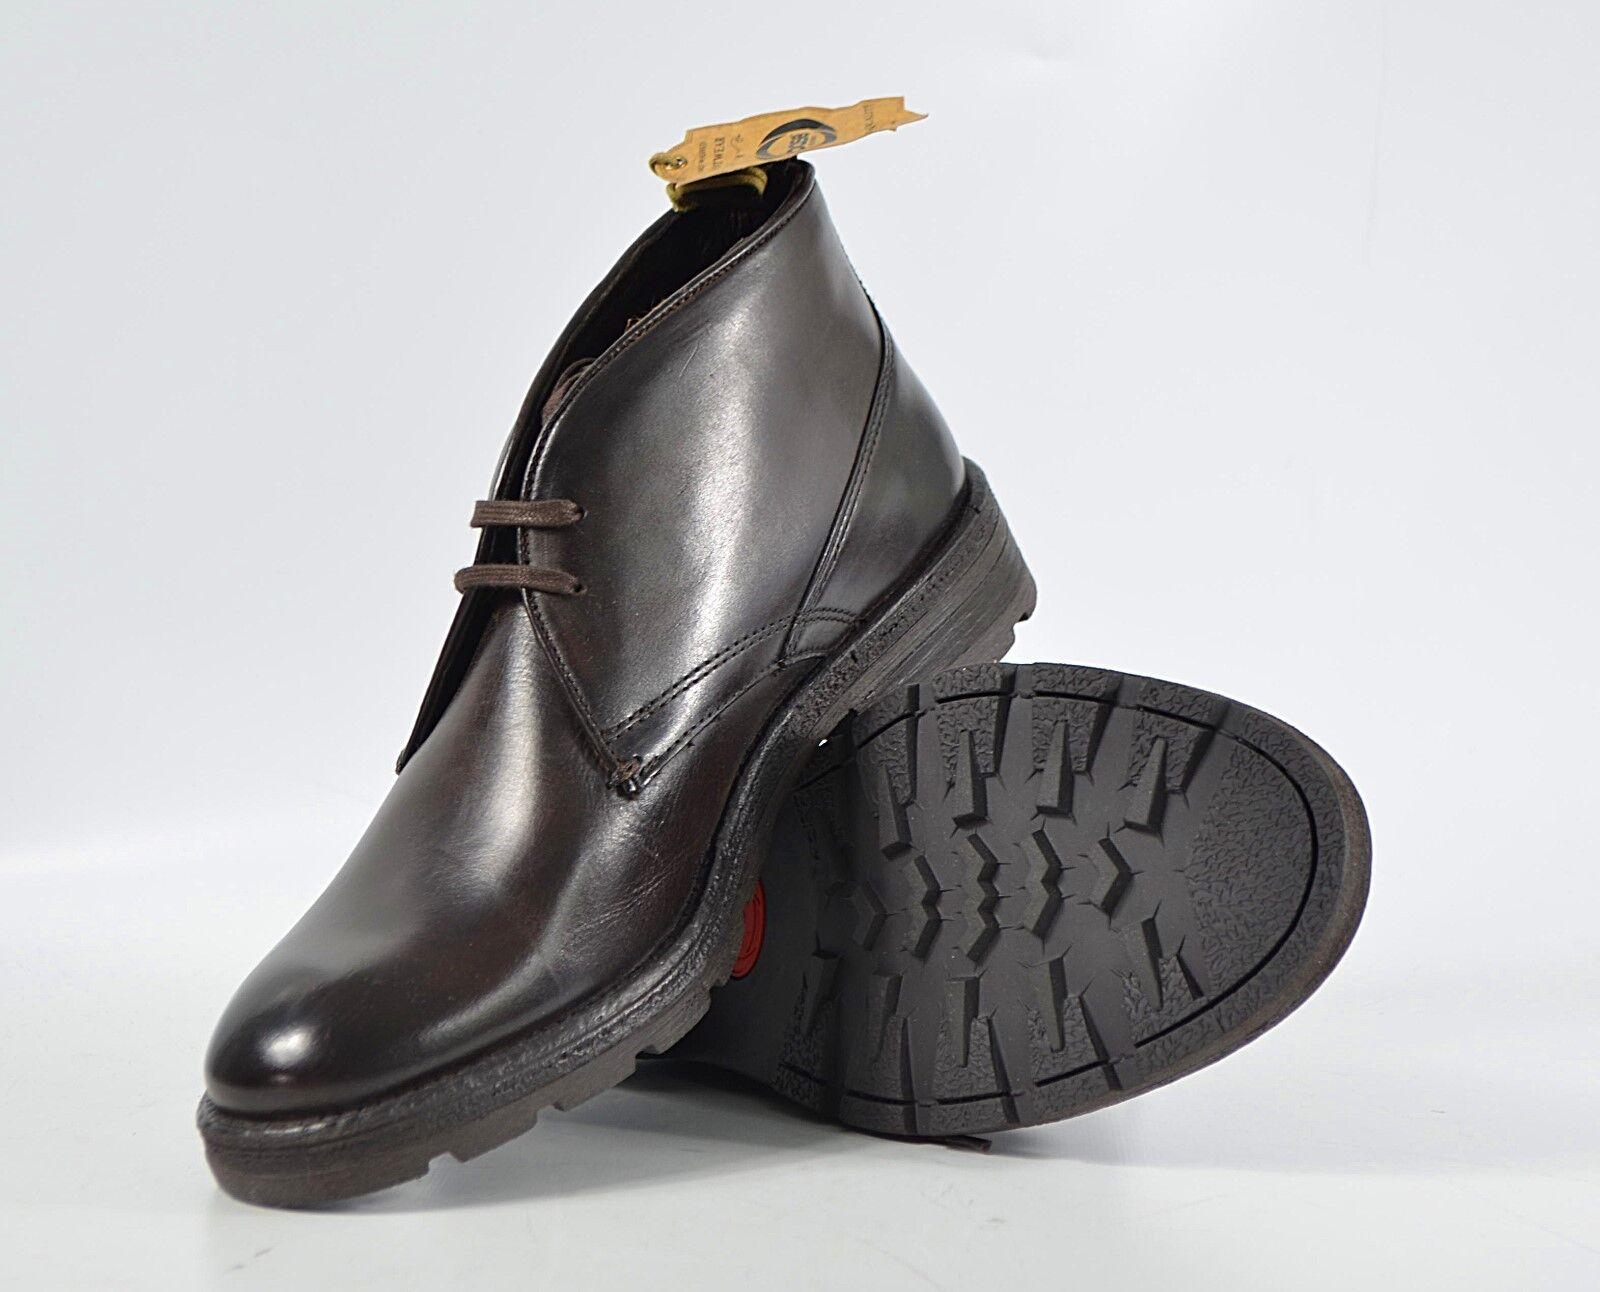 BASE LONDON Halbschuhe Archer Gr. 40 Leder, Schnürer, Herren Schuhe 5/18 M2 R3